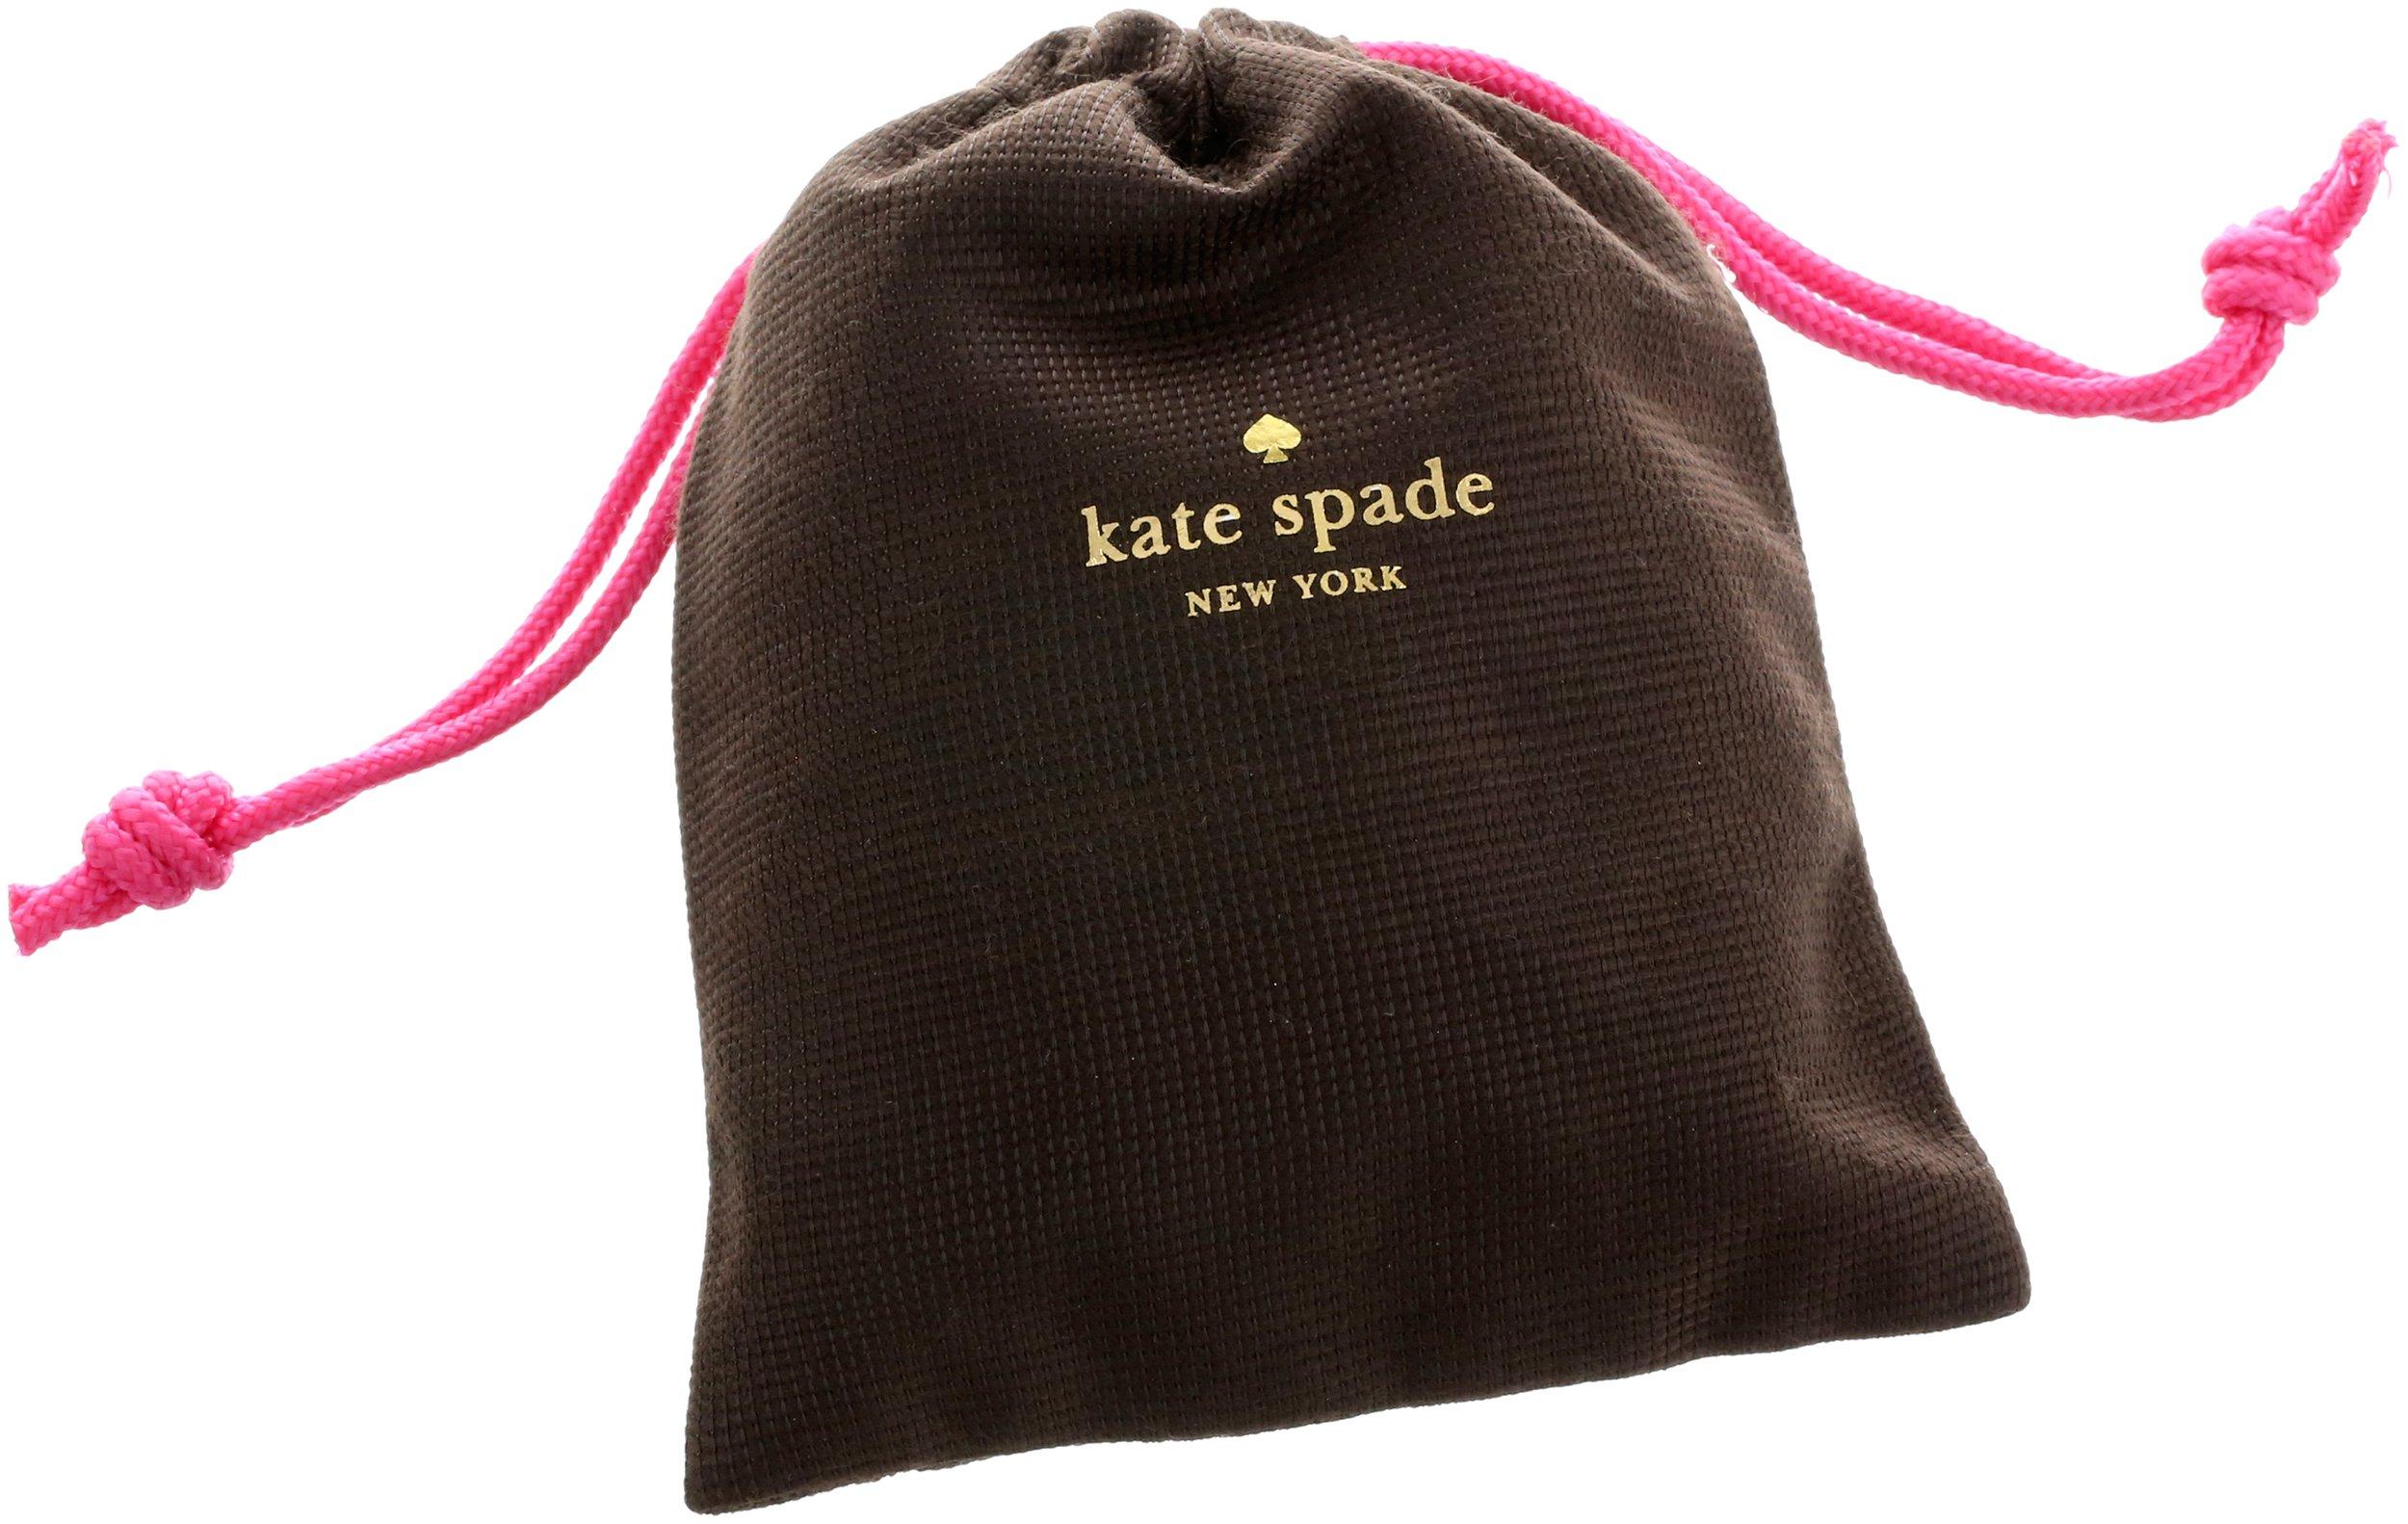 kate spade new york''Cueva Rosa'' Gold-Tone Pink Glass Stud Earrings by Kate Spade New York (Image #3)